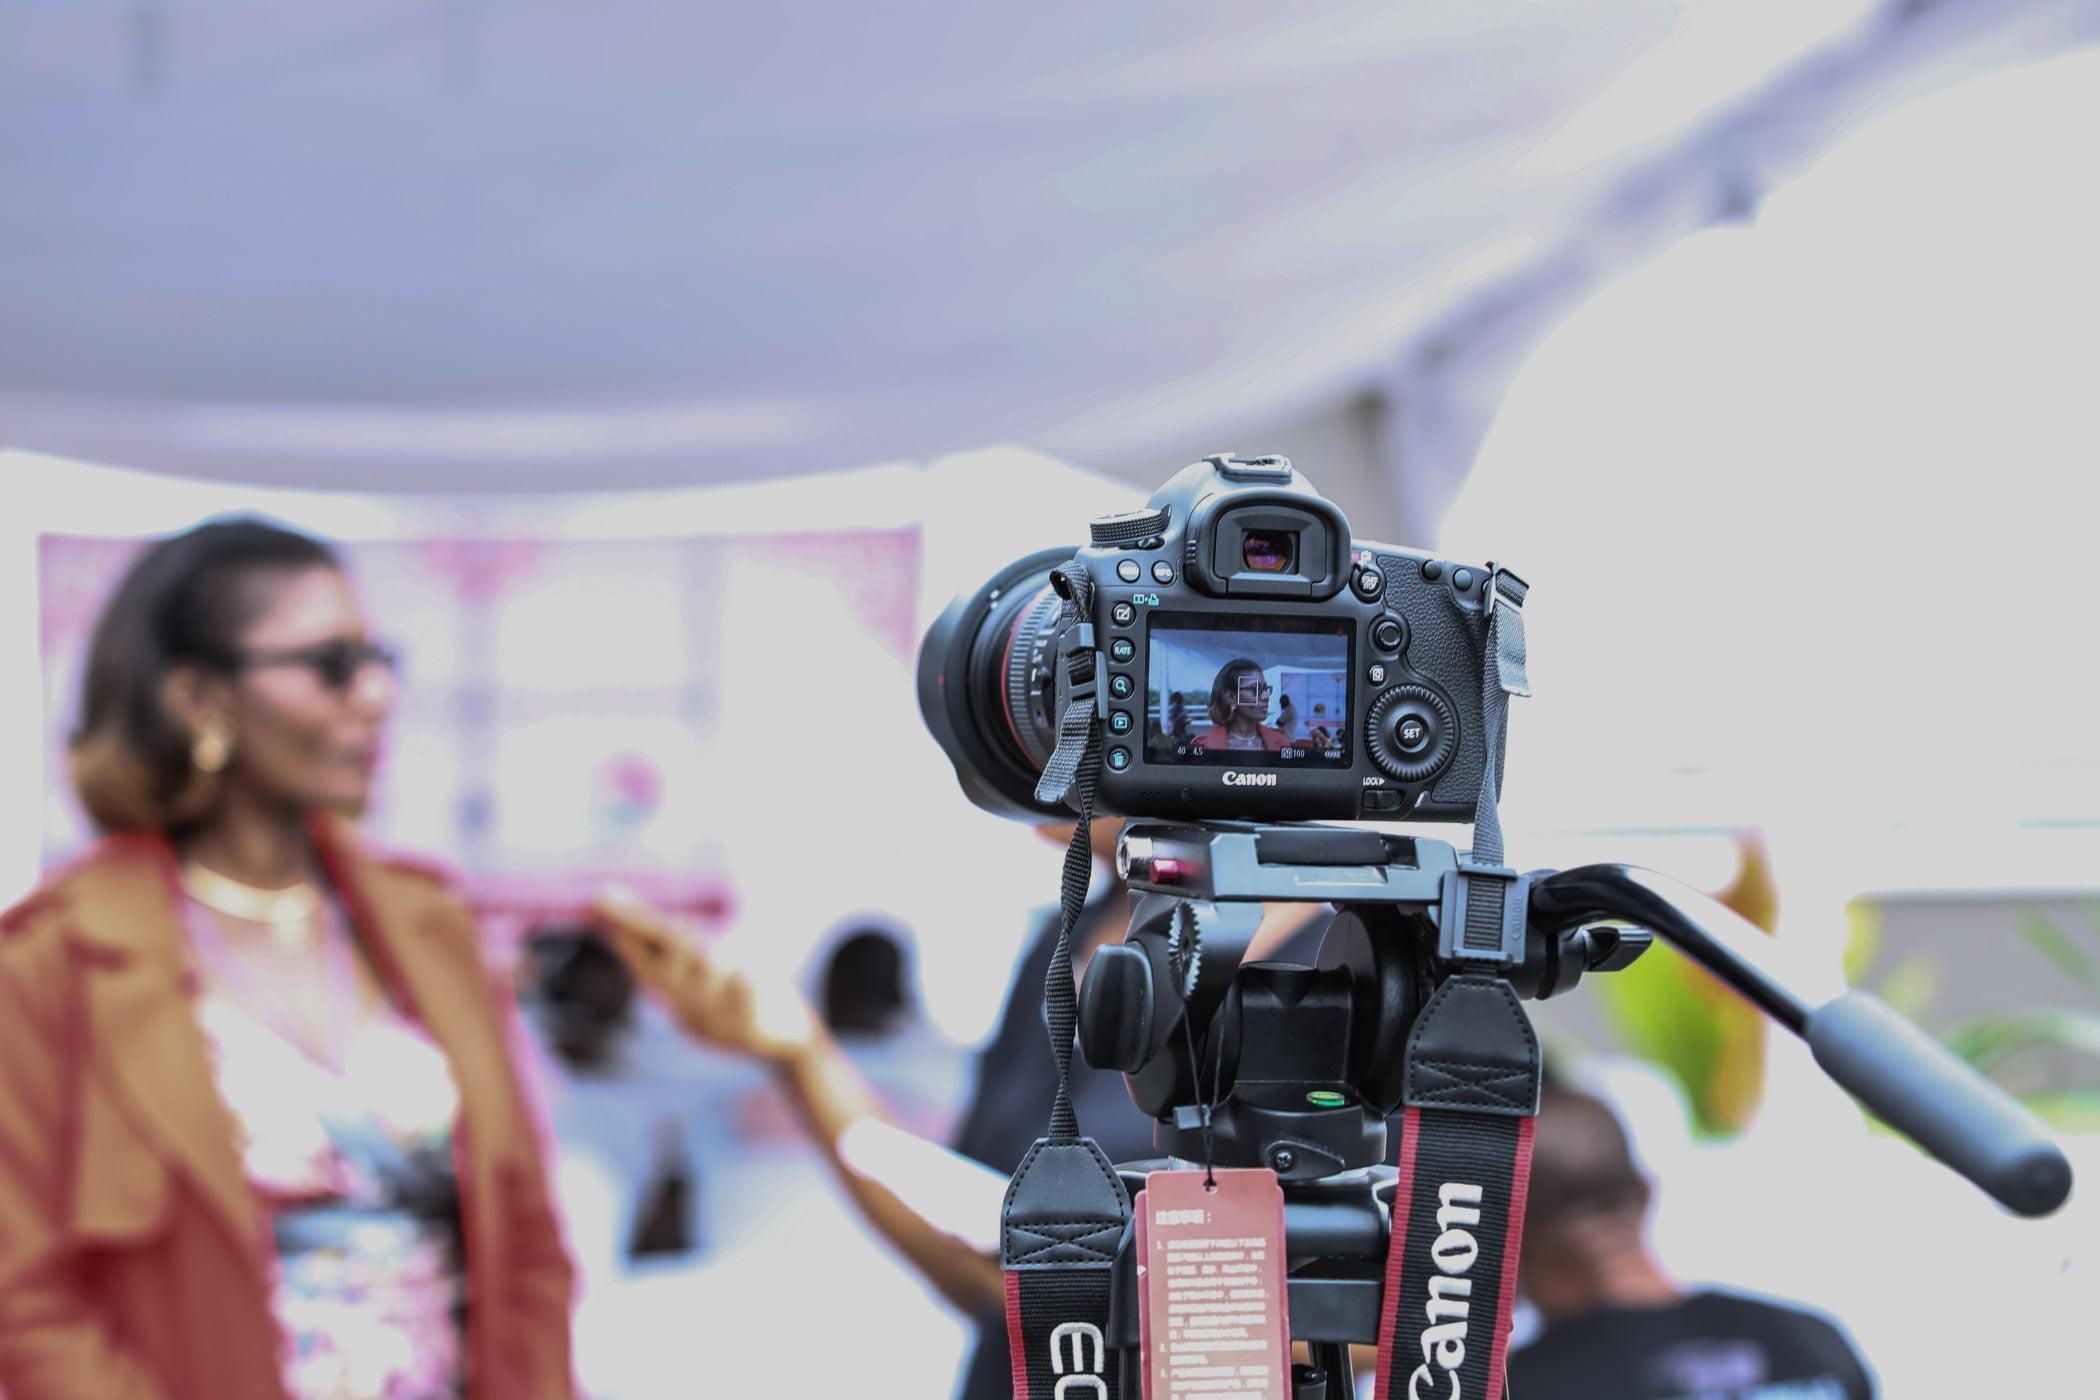 camera, camera equipment, interview